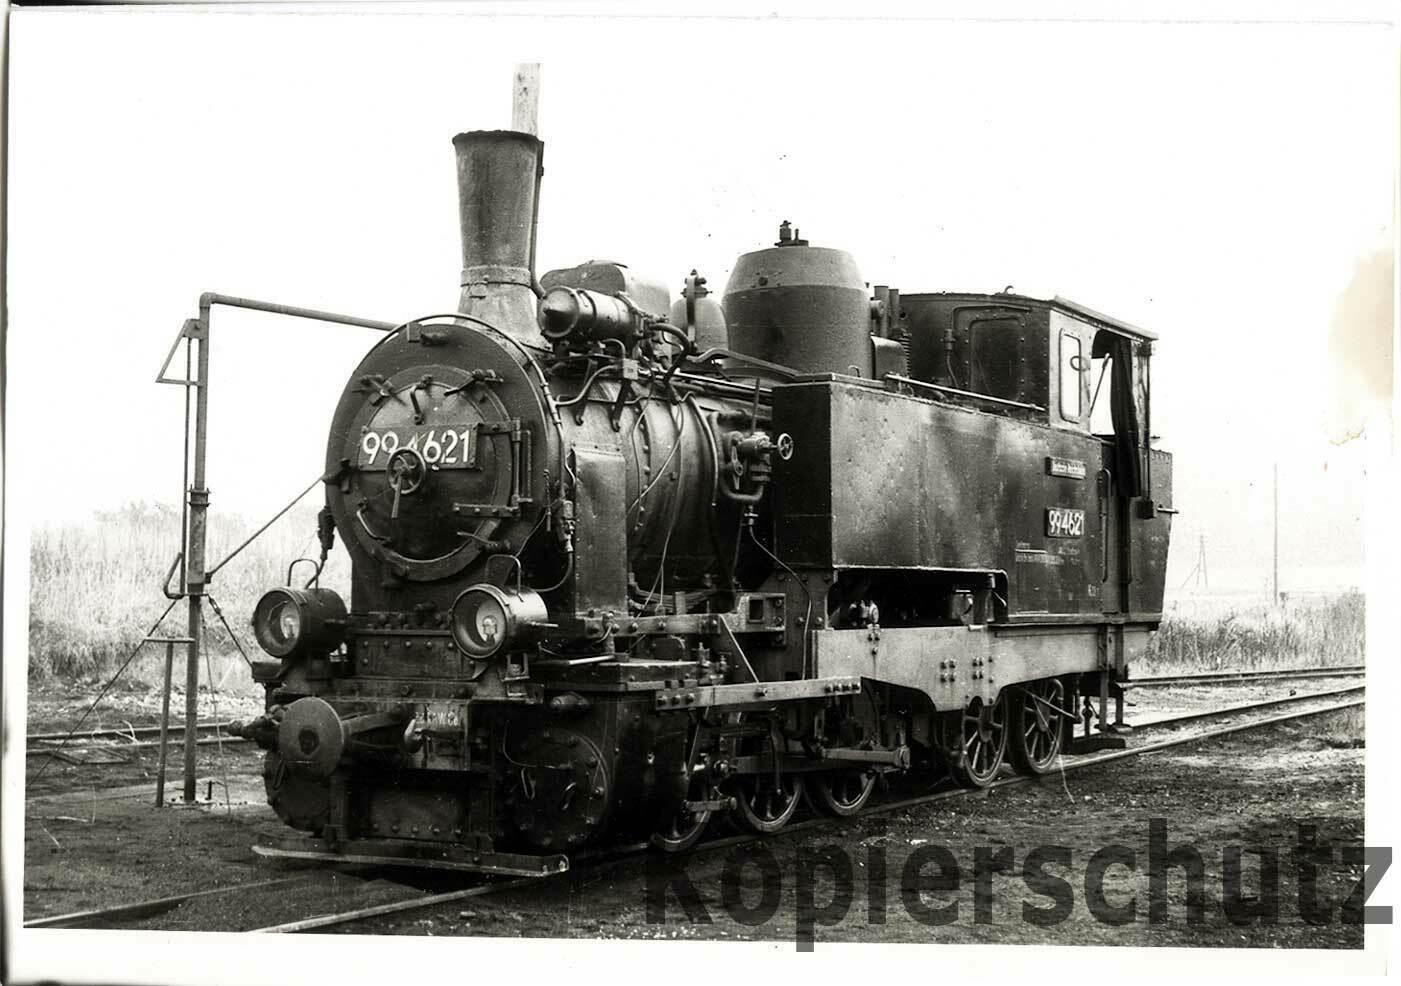 T36 GKW 99 4621 in Bergen Rügen, 1957.jpg